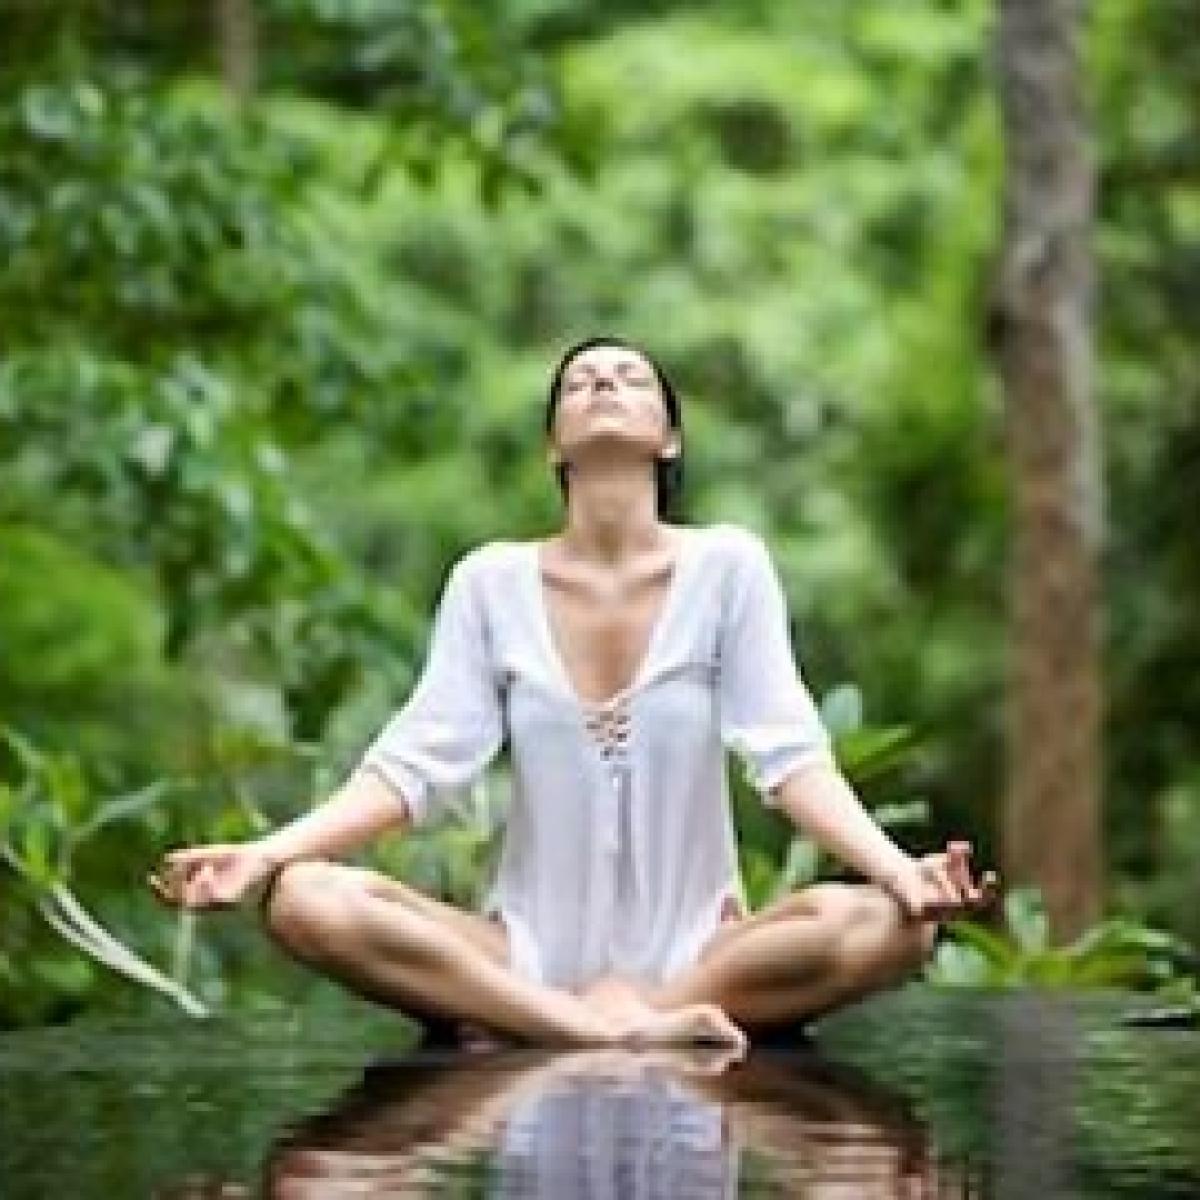 Guiding Light: Mountain Yoga and Meditation